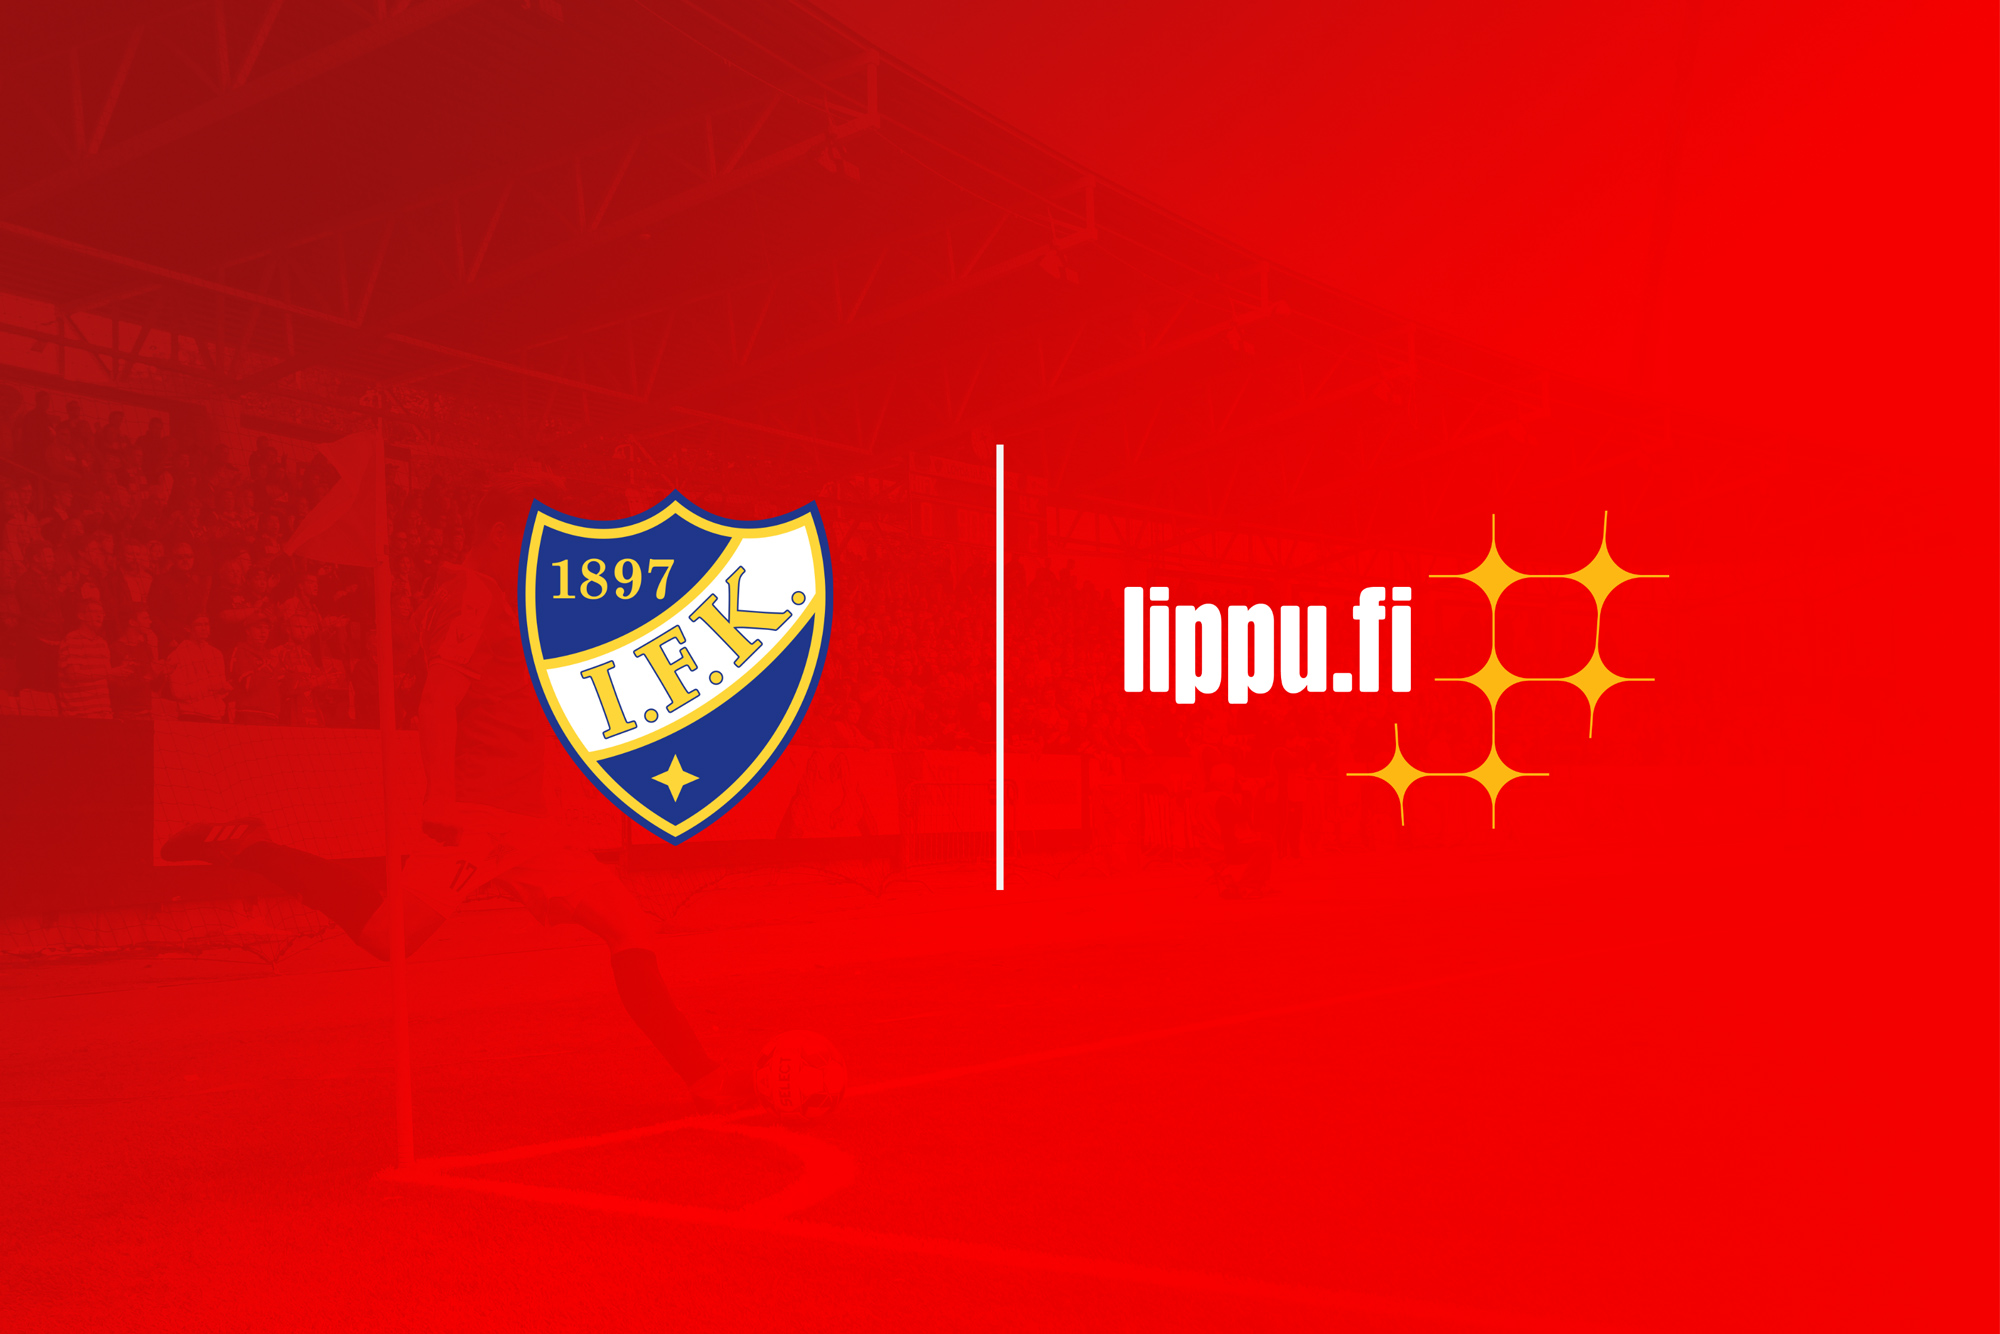 HIFK och Lippupiste inleder samarbete